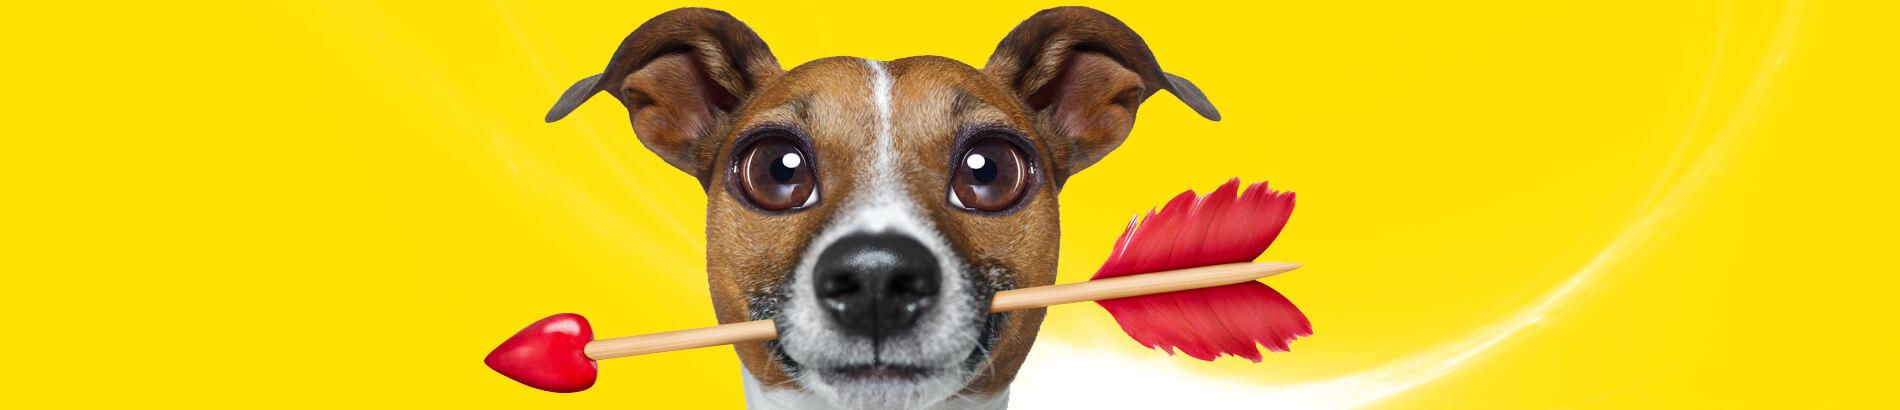 banner-dog